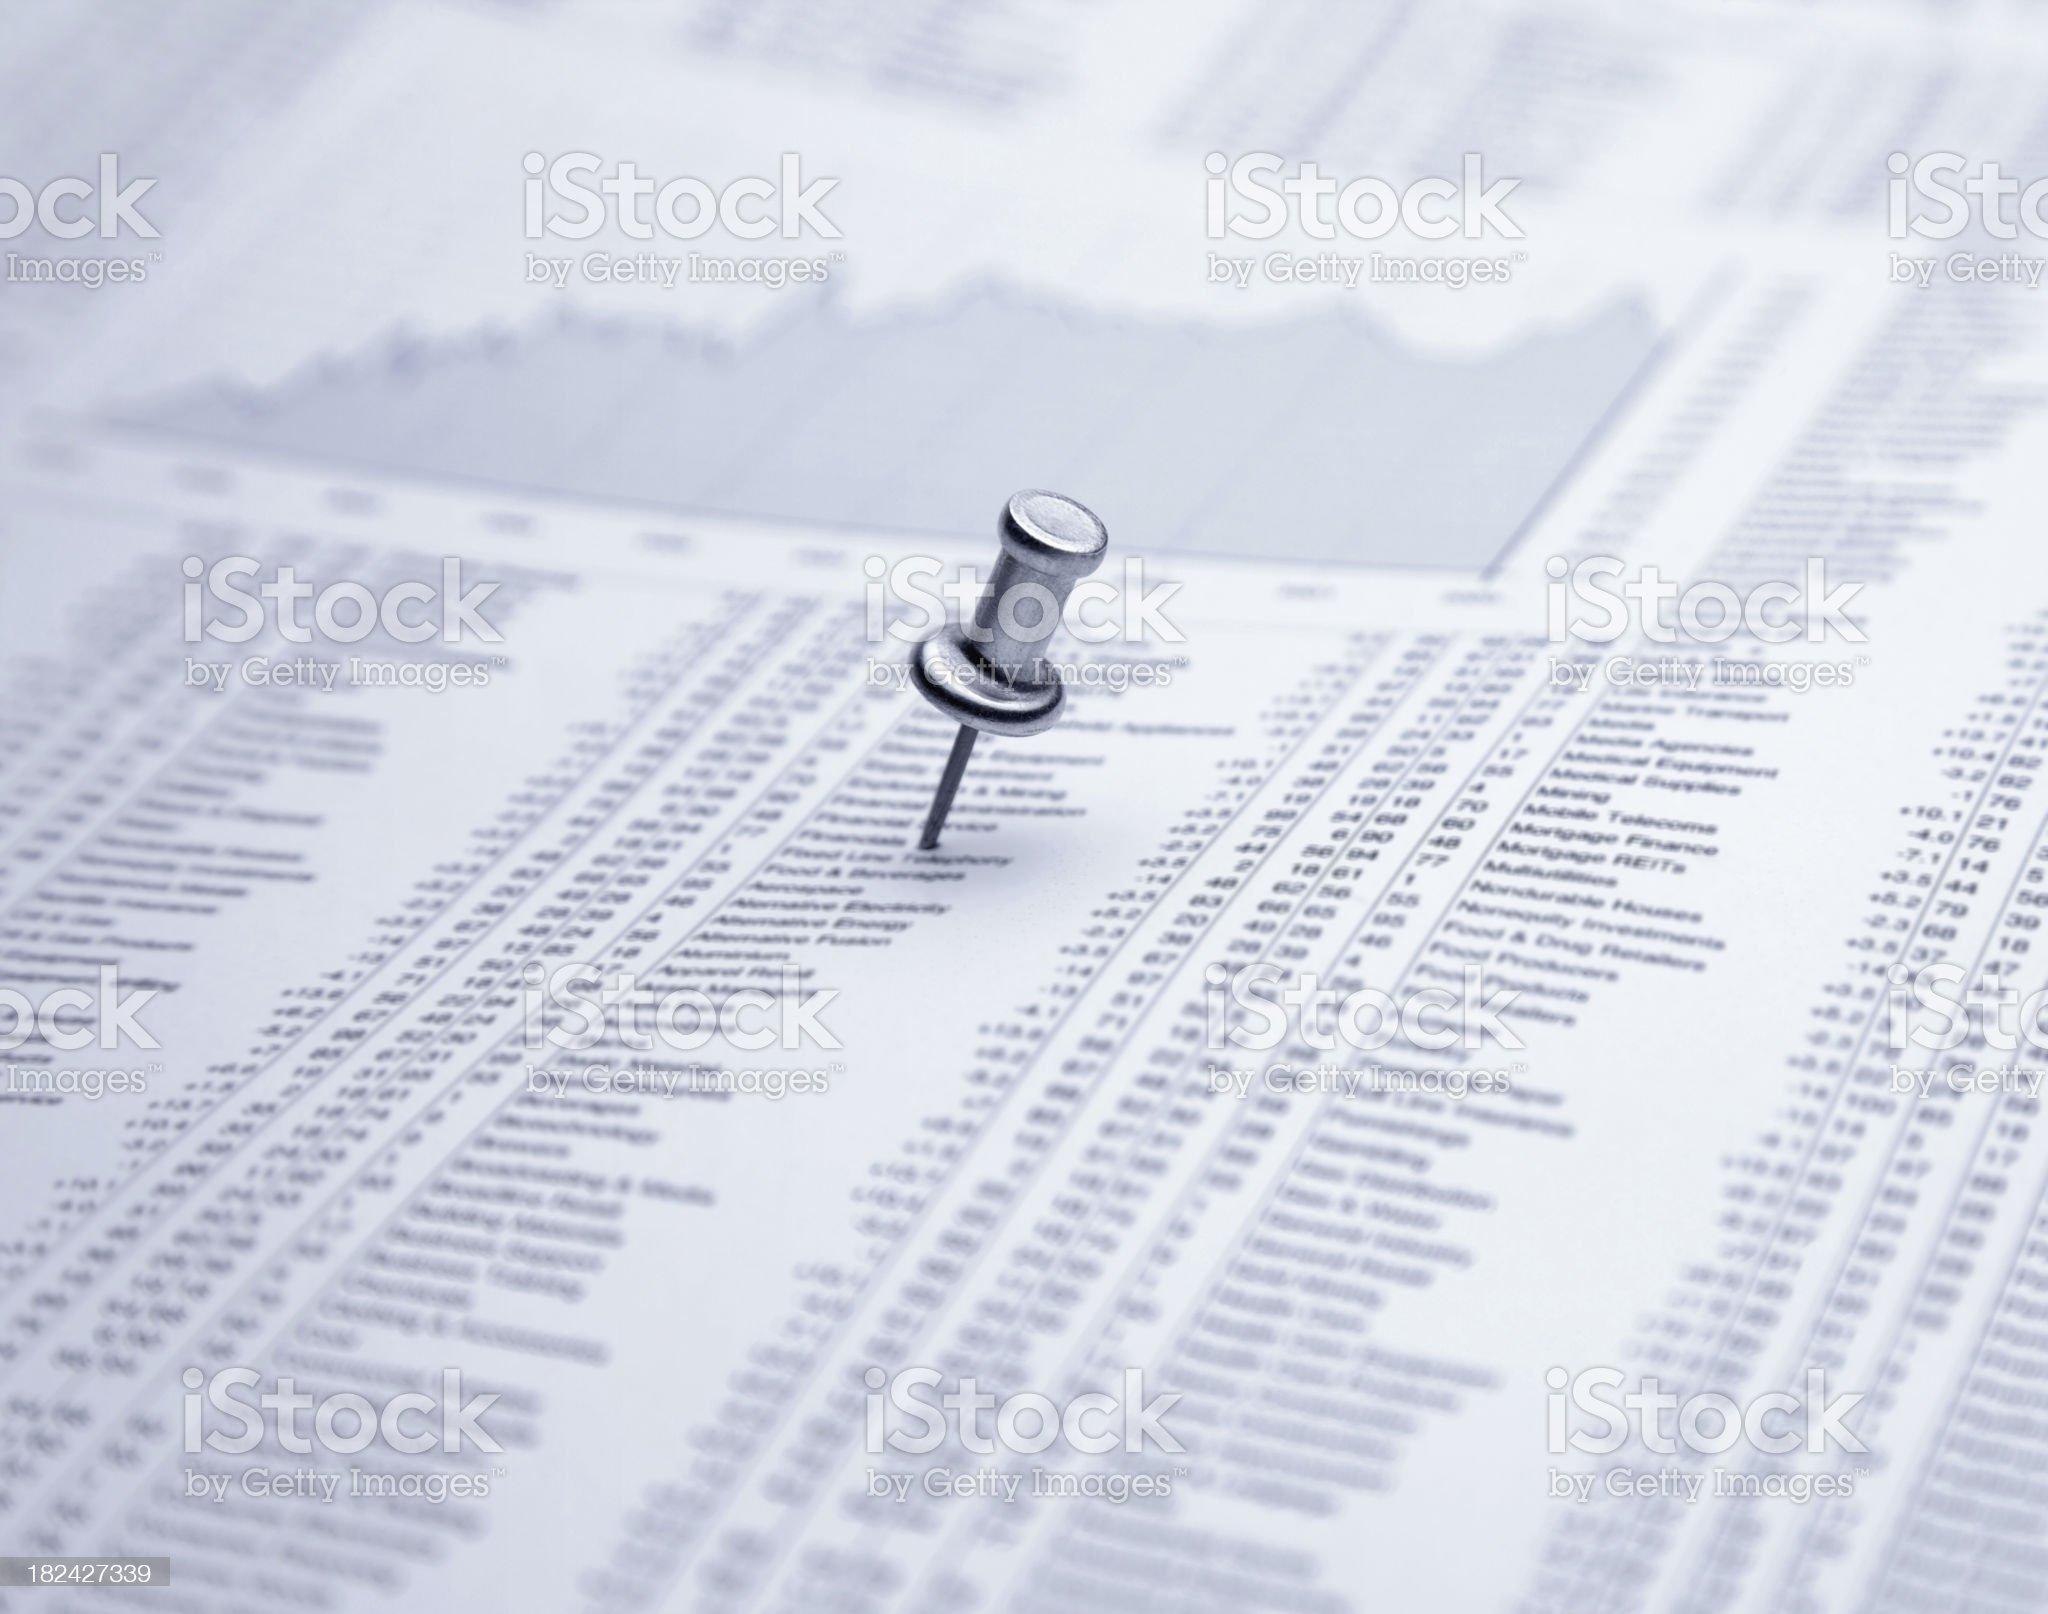 Push pin on financial newspaper royalty-free stock photo